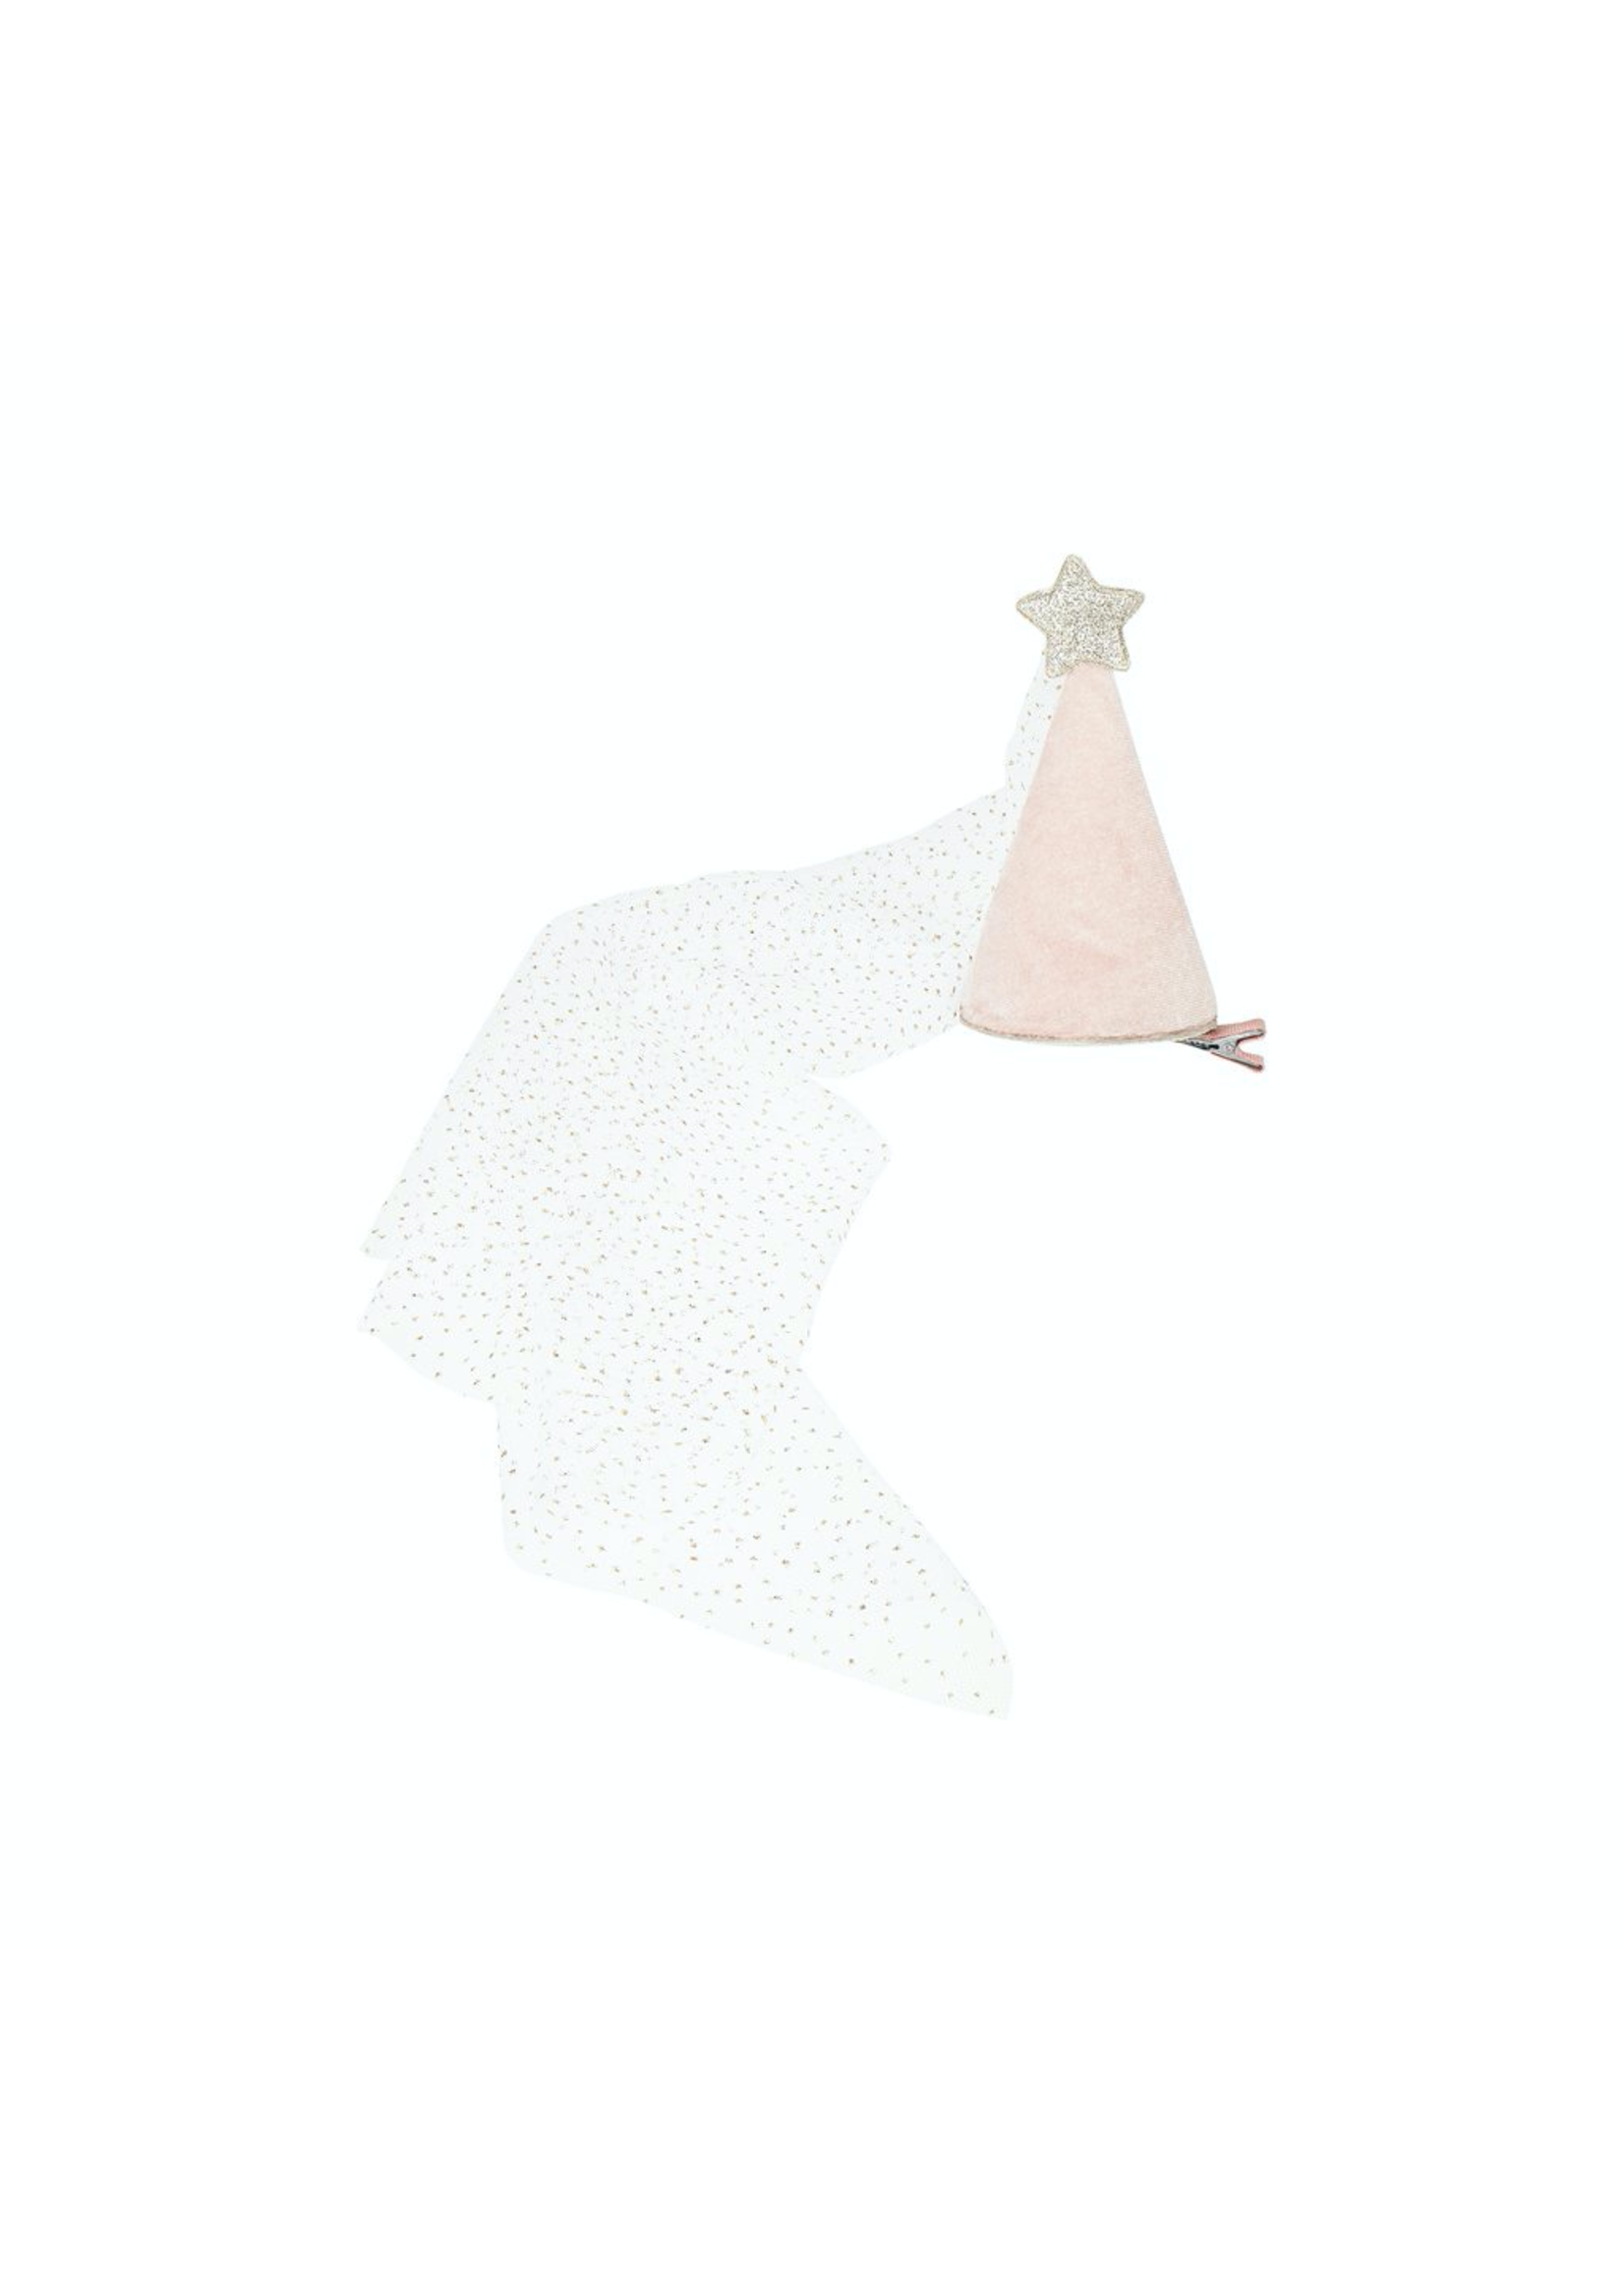 Mimi & Lula Mimi & Lula, Princess Hat, Pink / Silver Sparkle